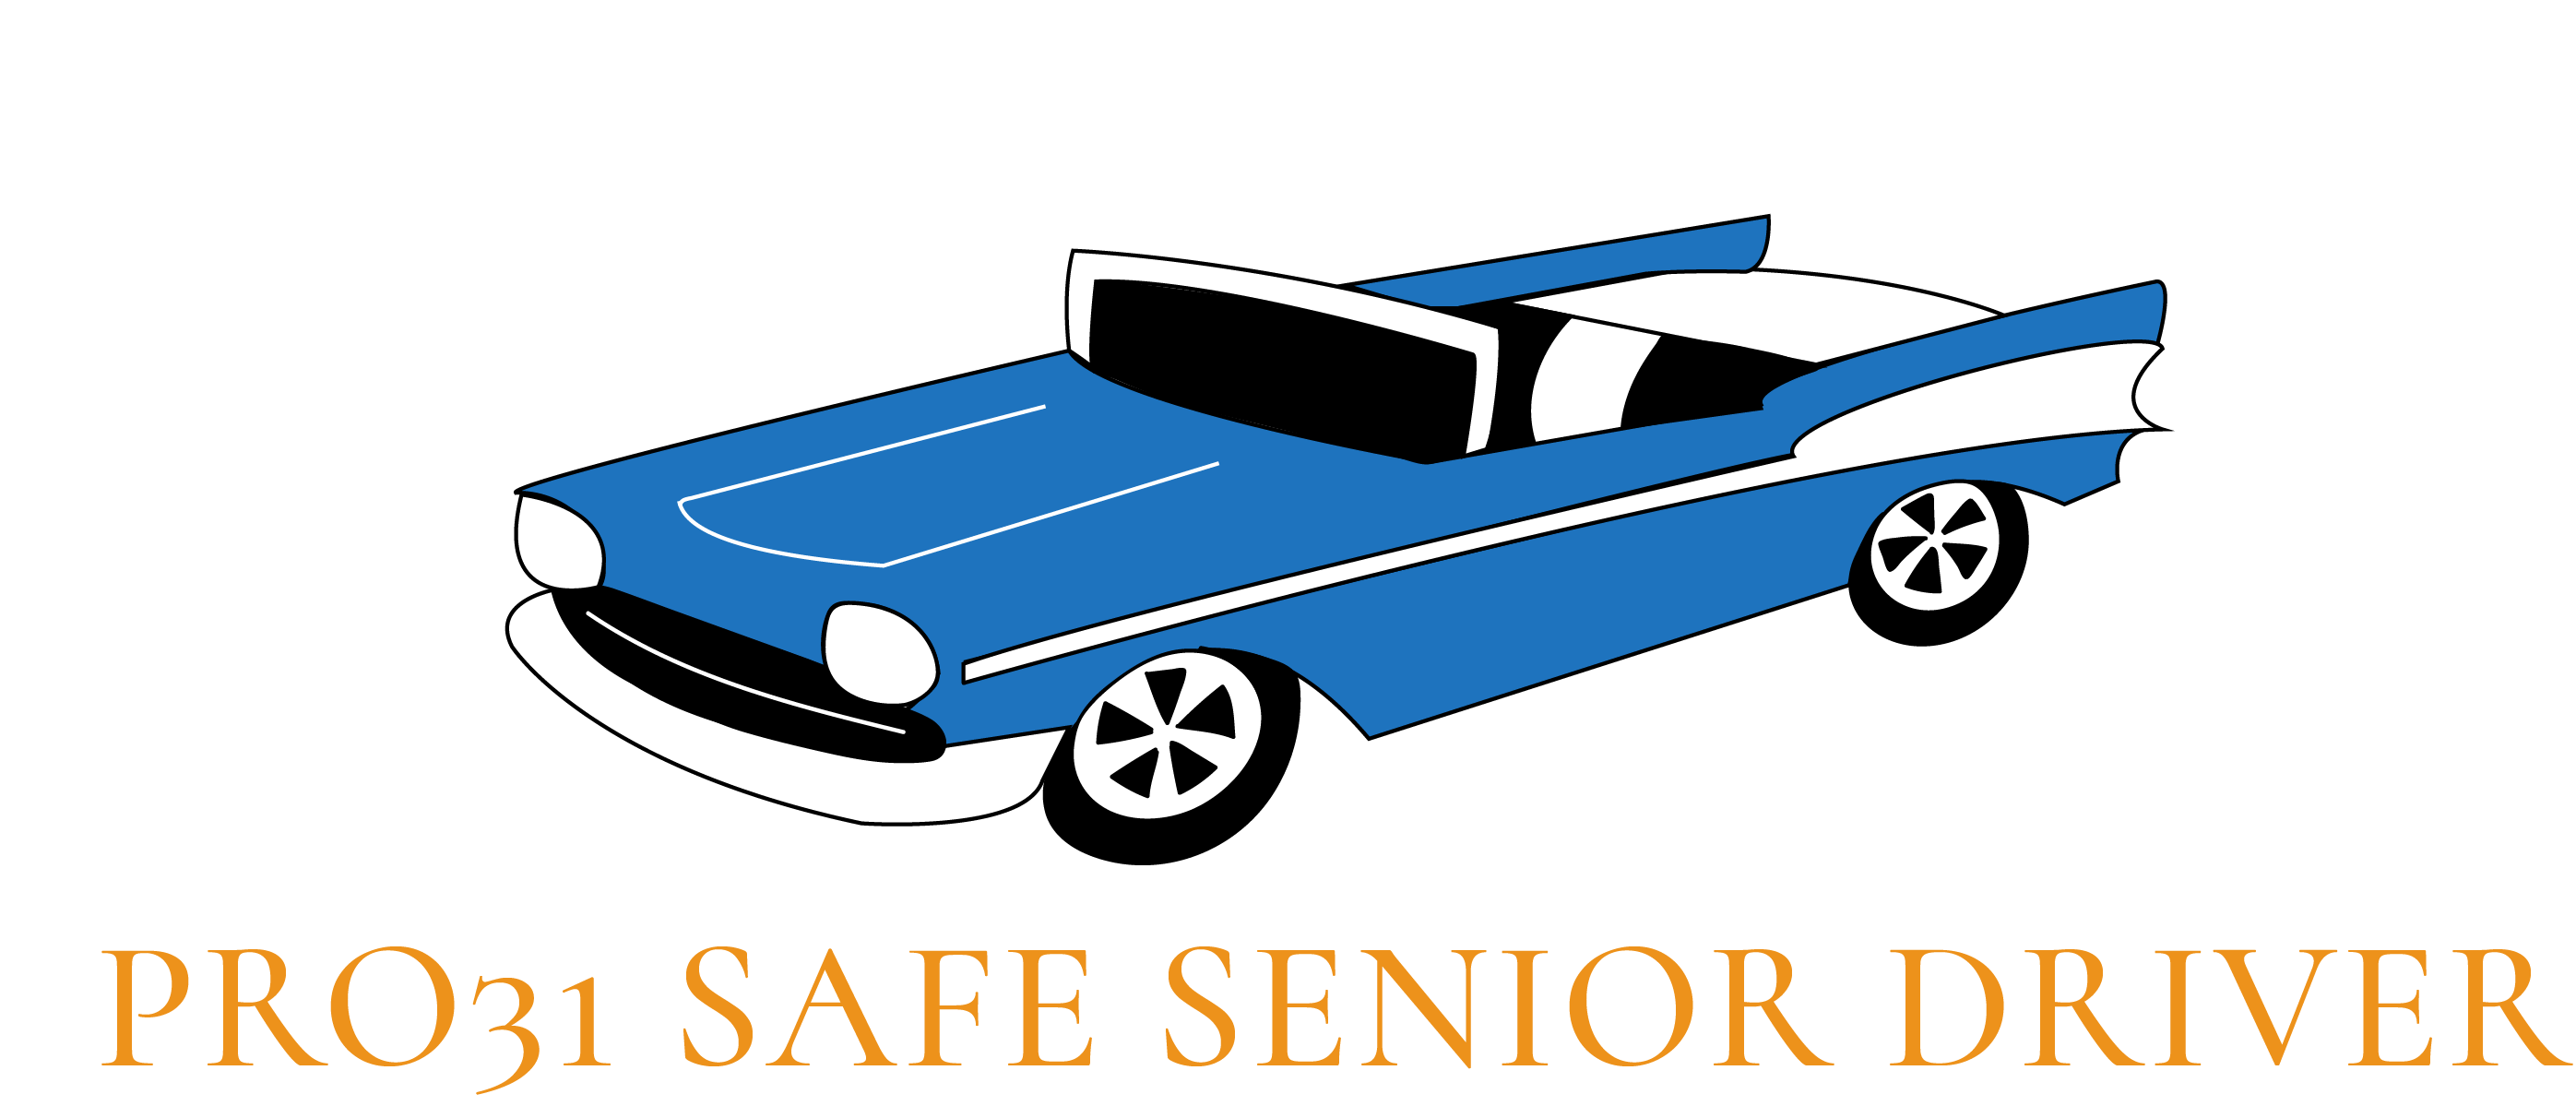 Pro31 Safe Senior Driver